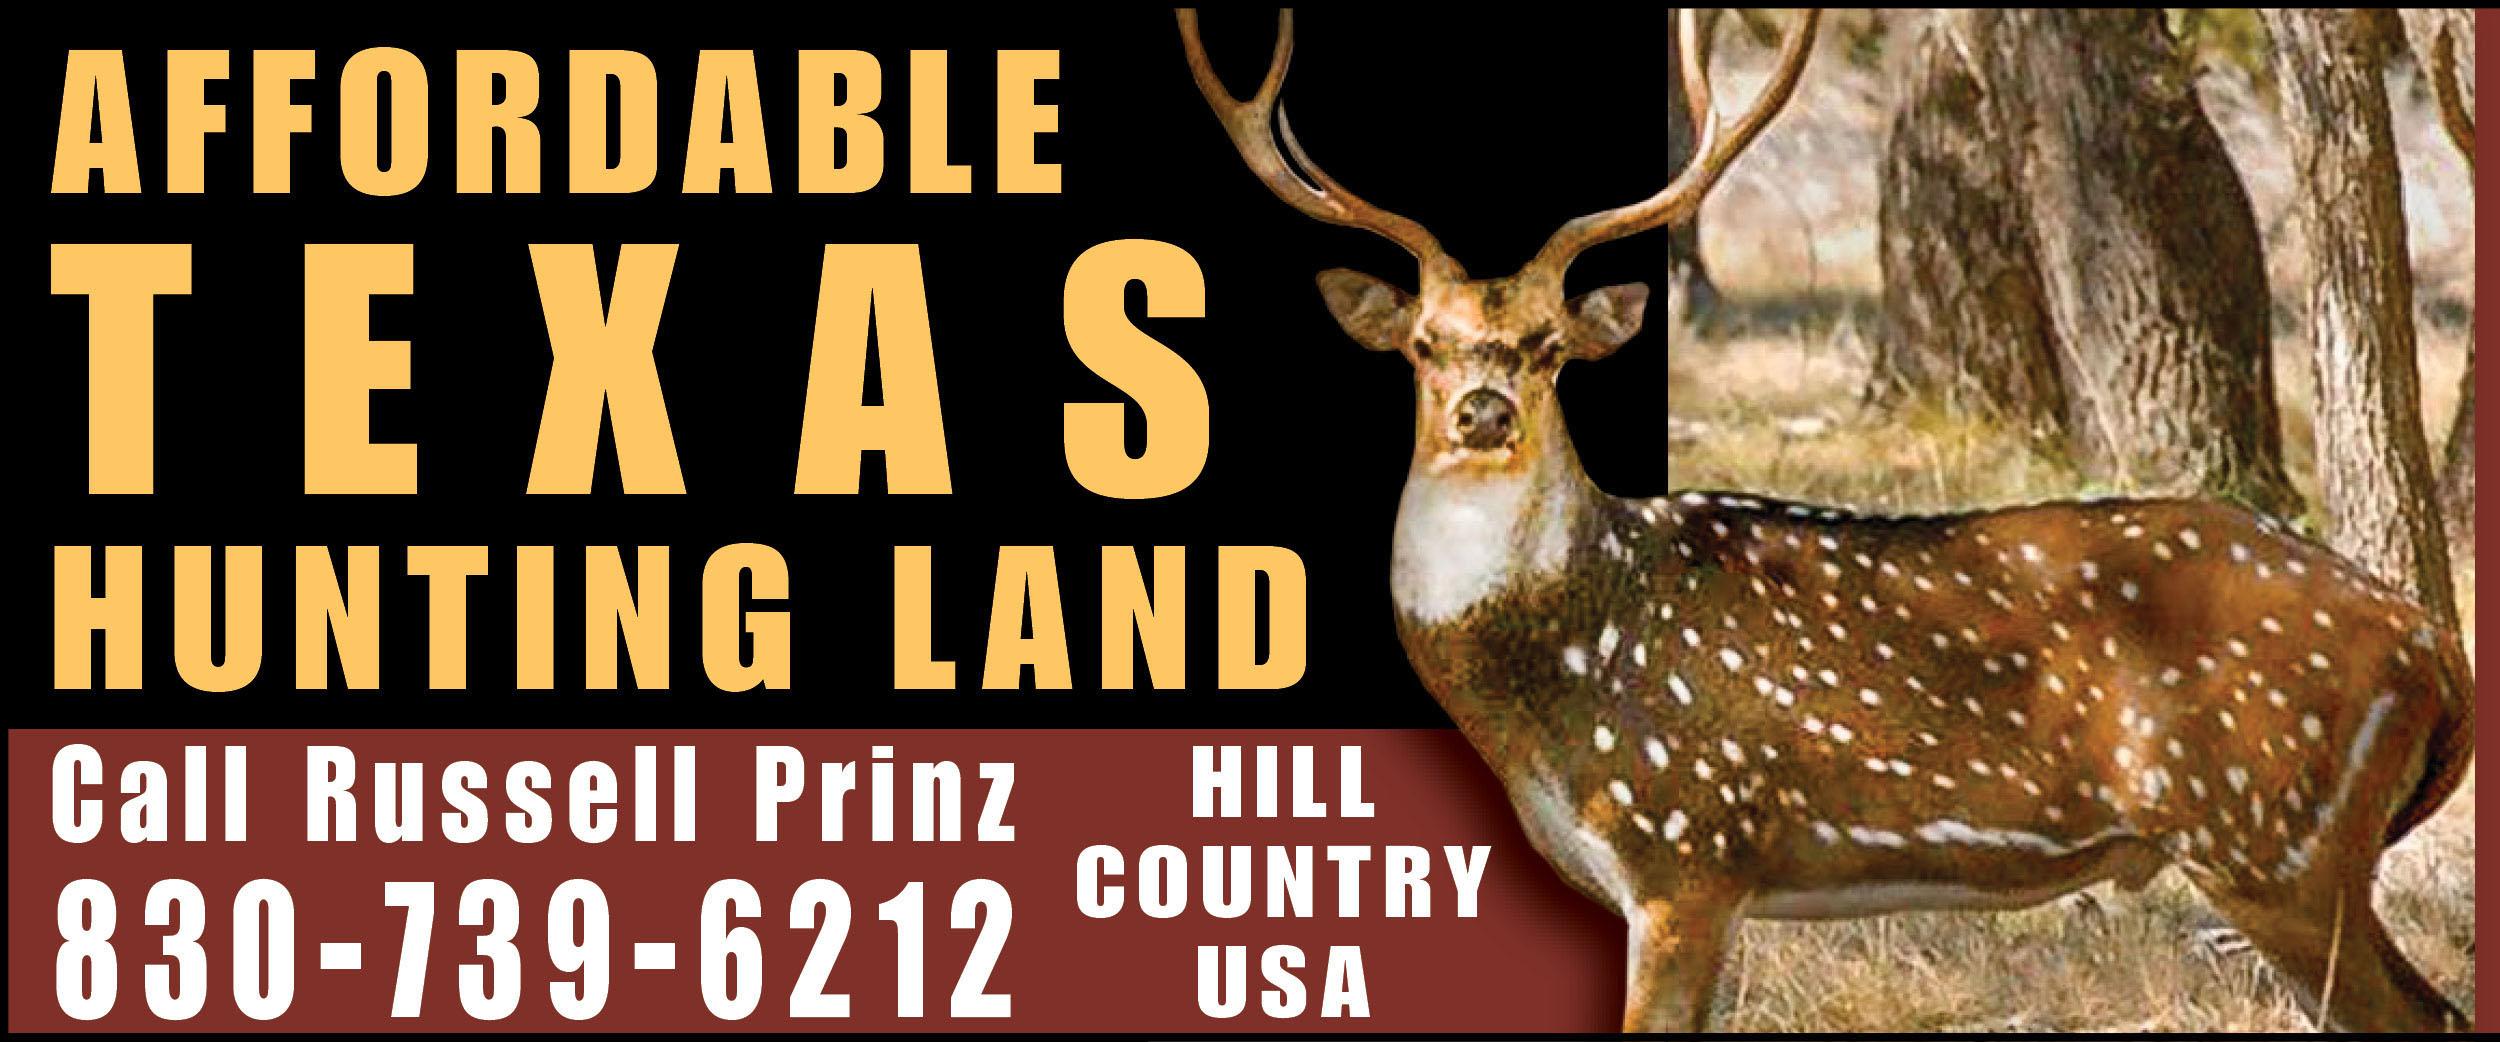 Hill Country USA Billboard